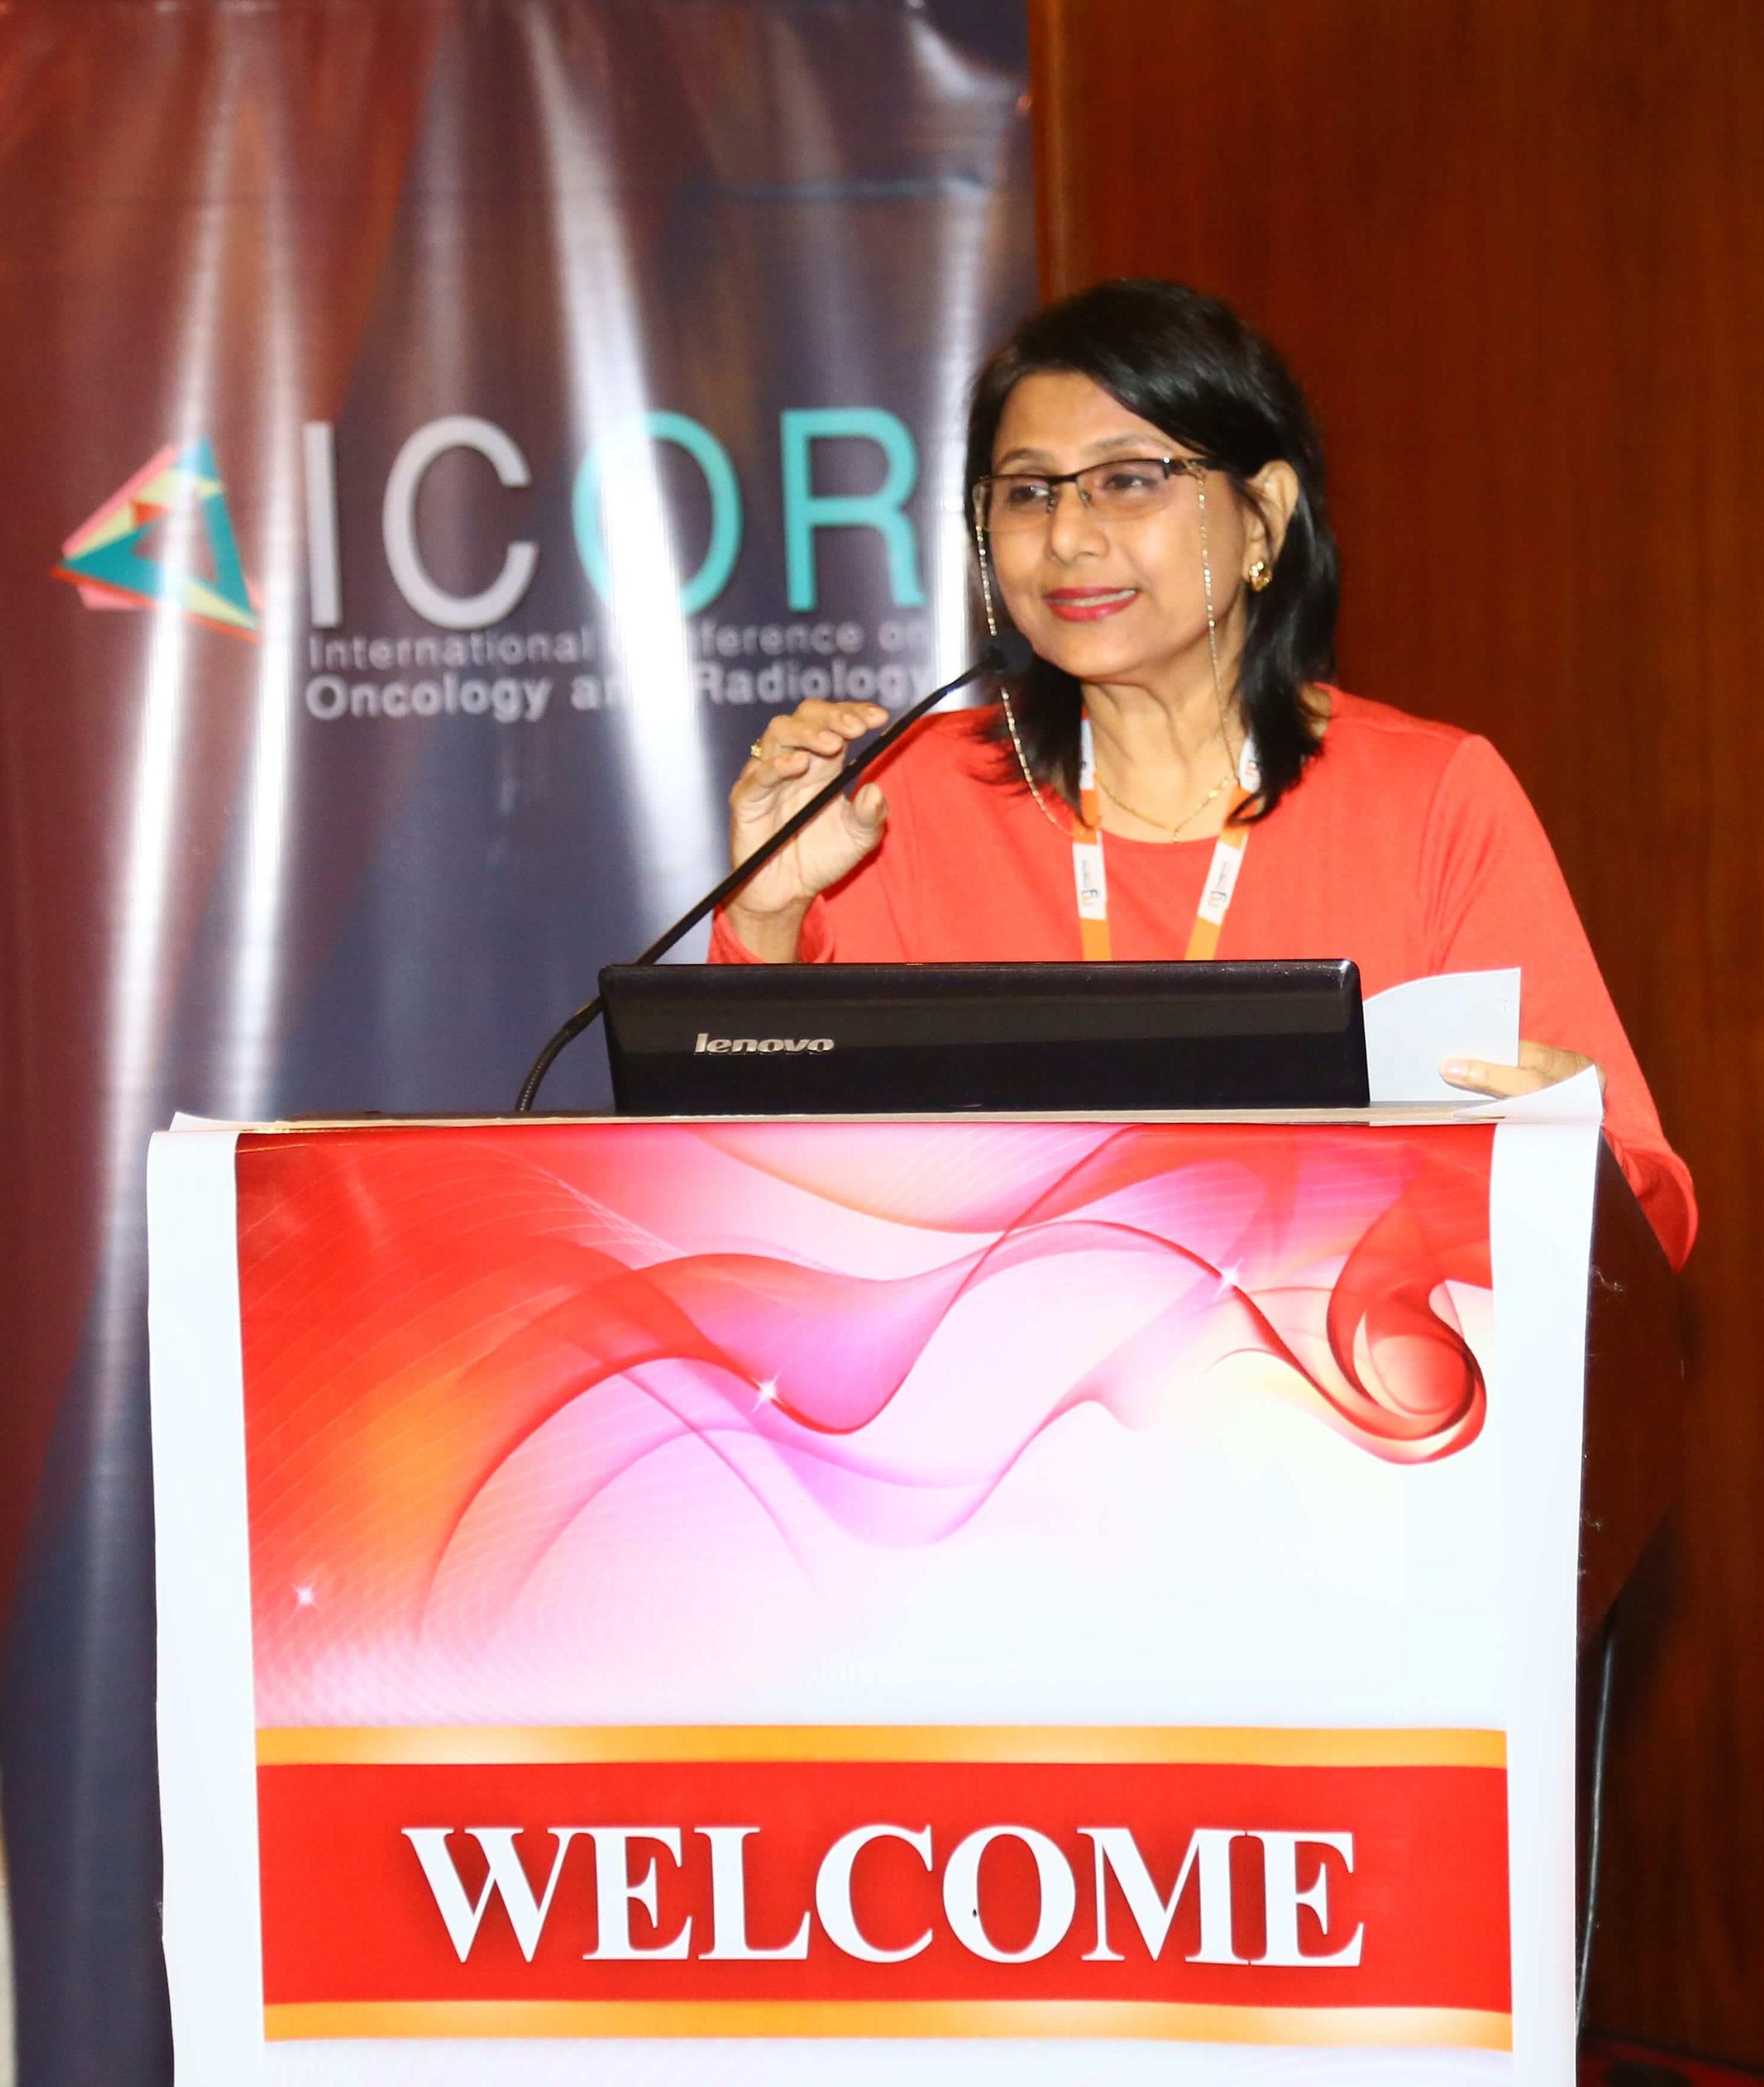 Cancer education conferences - Dr. Debjani Dasgupta